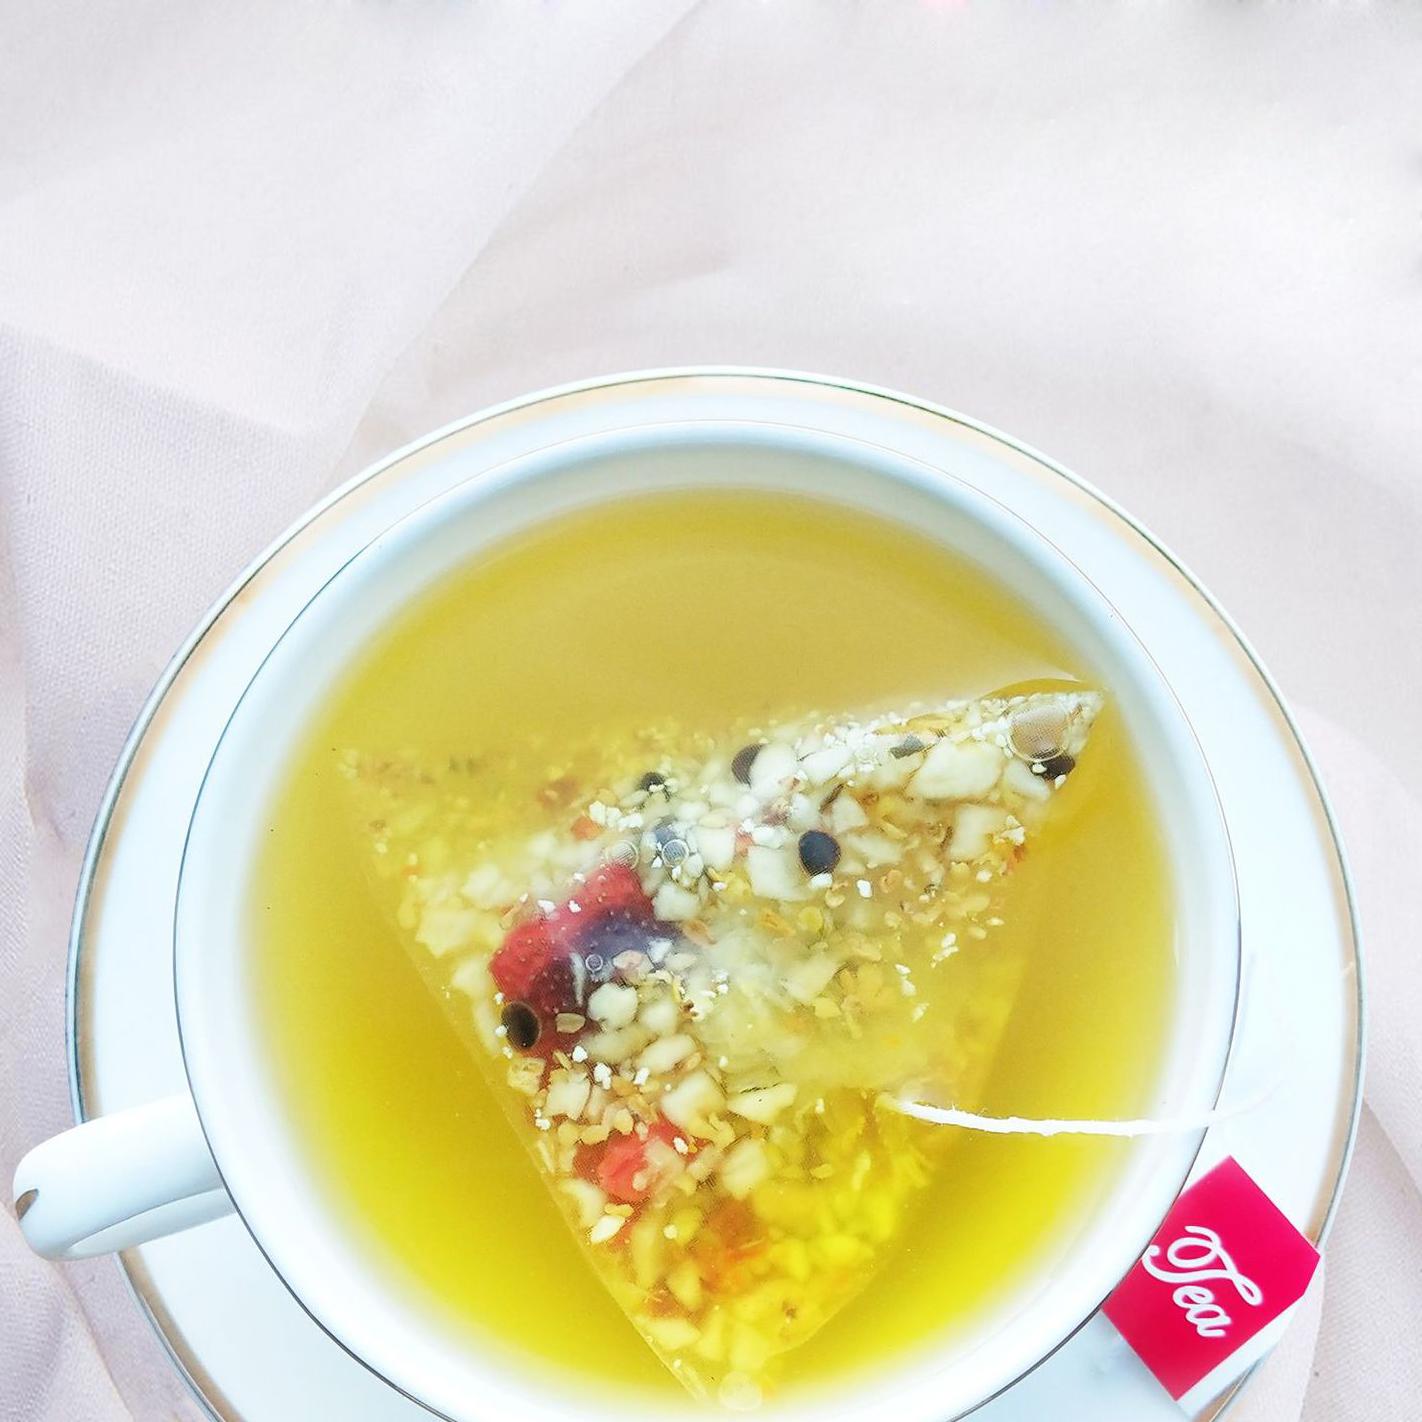 2021 Wholesale Private Label Organic Dried Flower Tea Individual Pack Bloosom Blooming Detox Herbal After-drinking Tea - 4uTea   4uTea.com